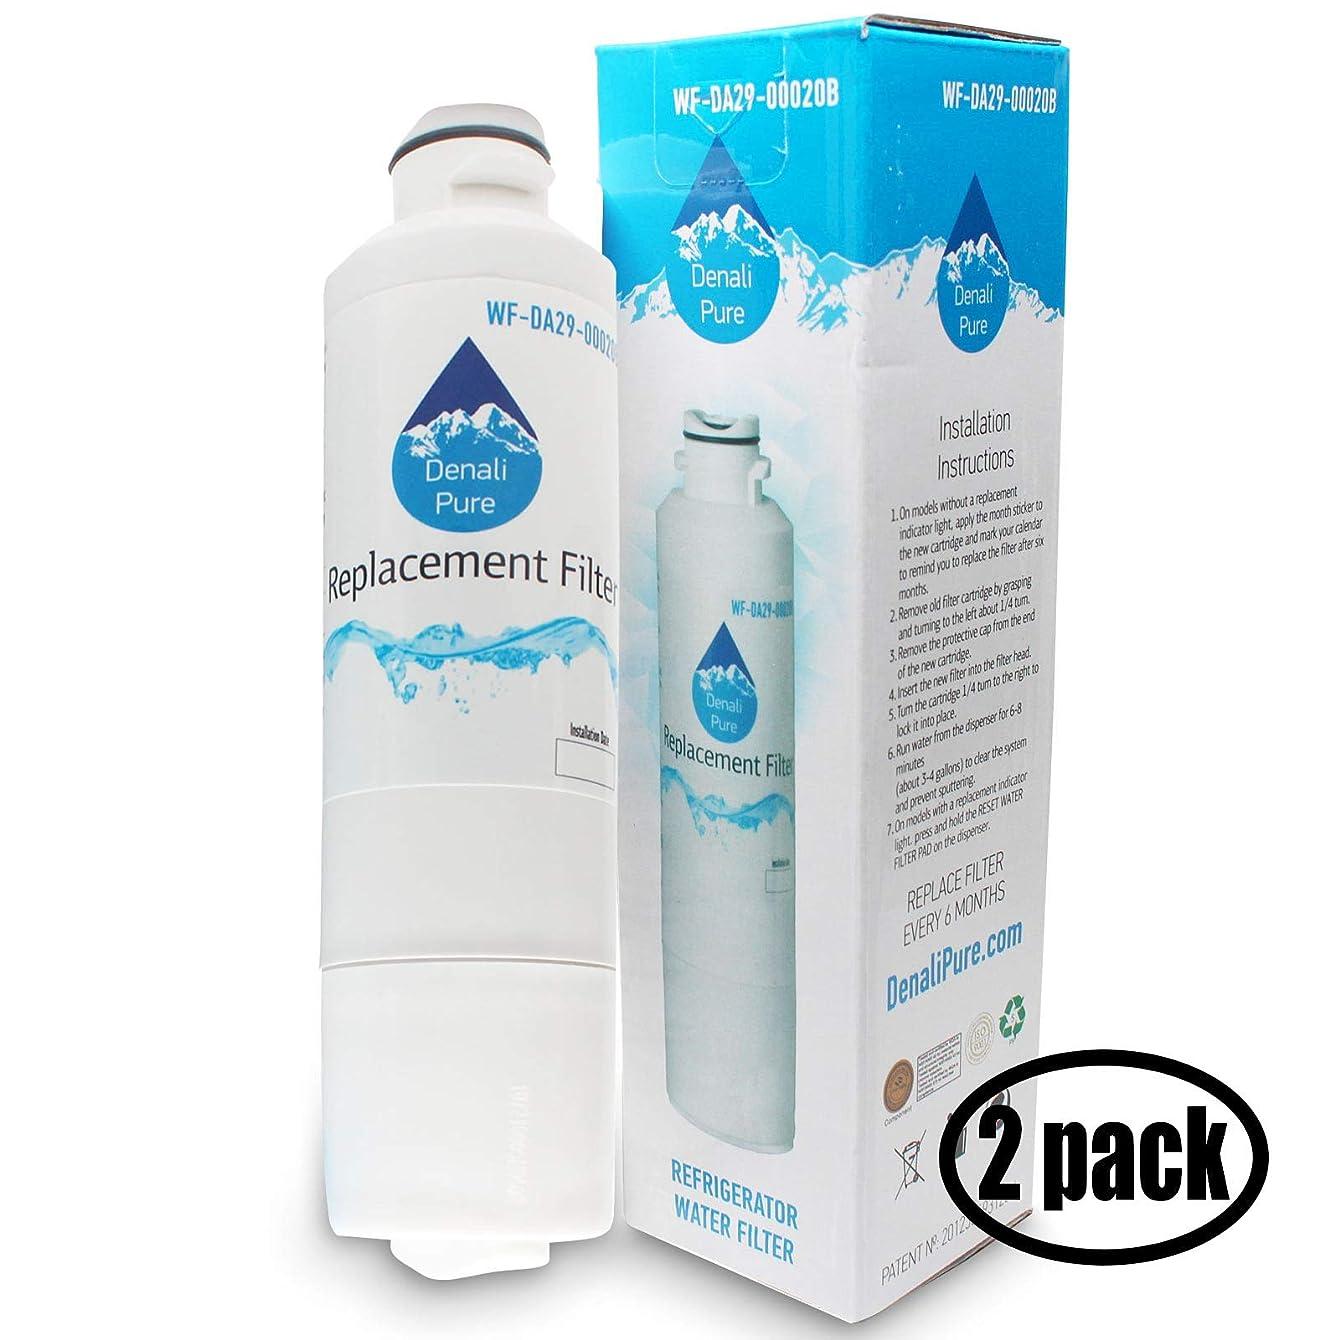 2-Pack Replacement Samsung RS261MDWP Refrigerator Water Filter - Compatible Samsung DA29-00020B, DA29-00020A, HAF-CIN Fridge Water Filter Cartridge